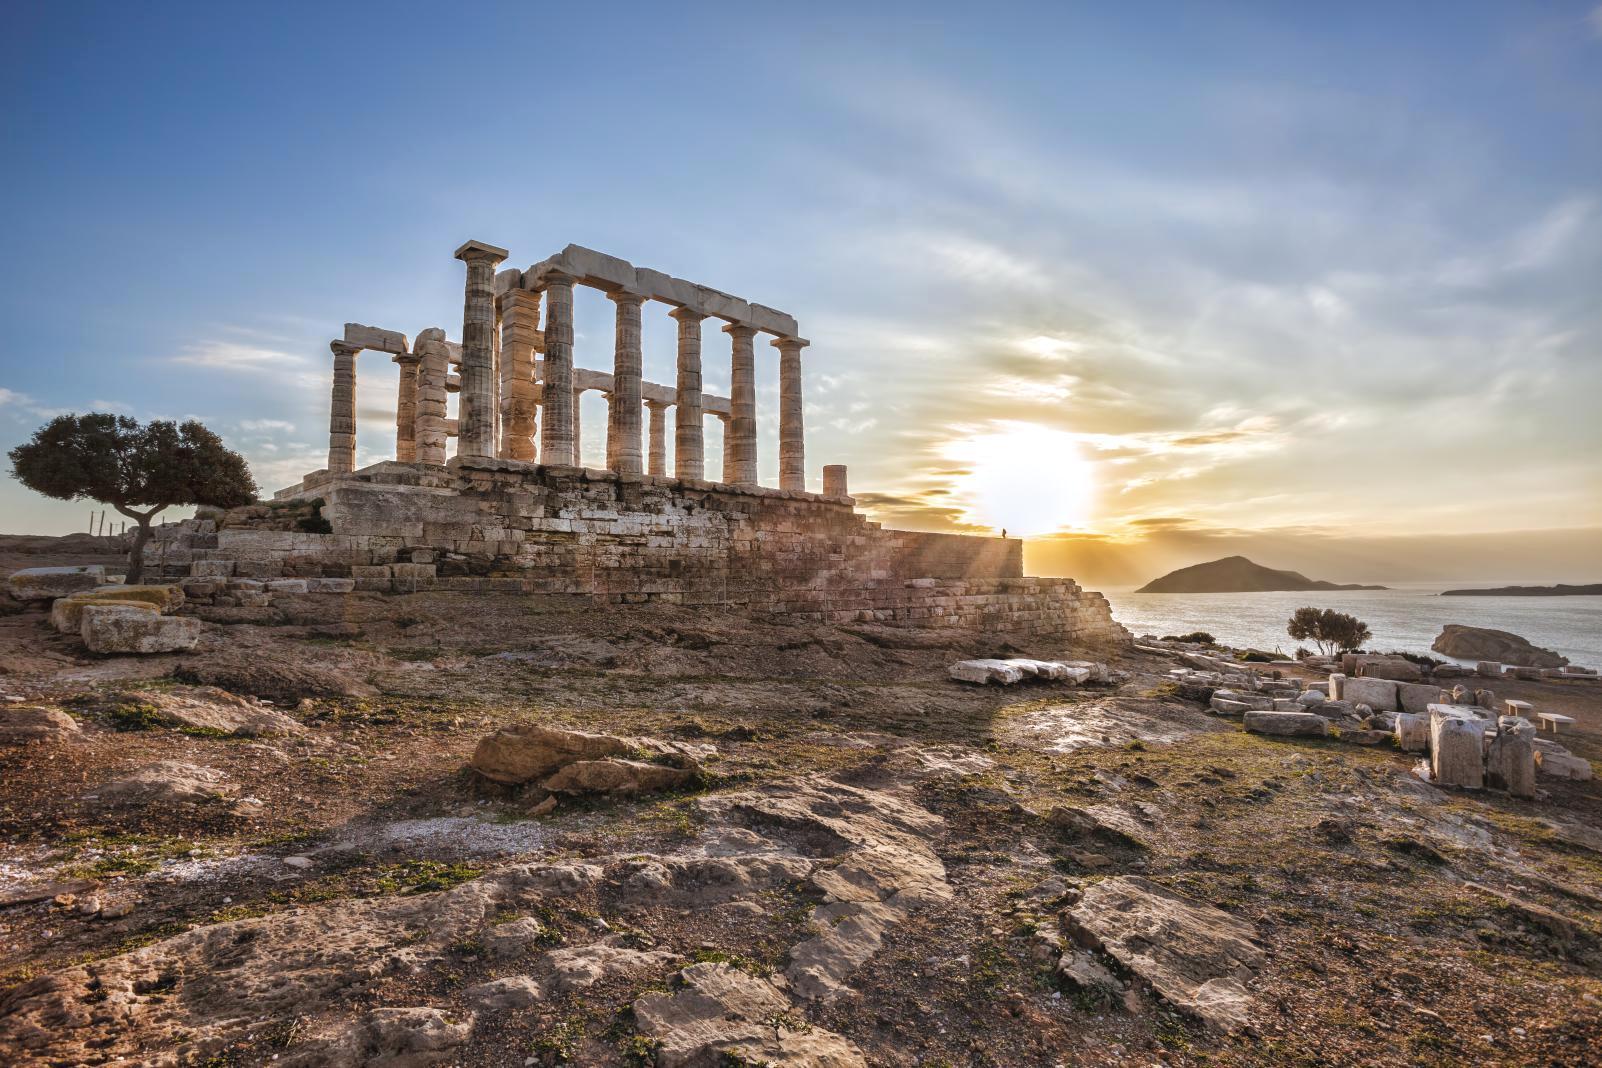 Cape Spunio Temple of Poseidon Percy Jackson Small group tour